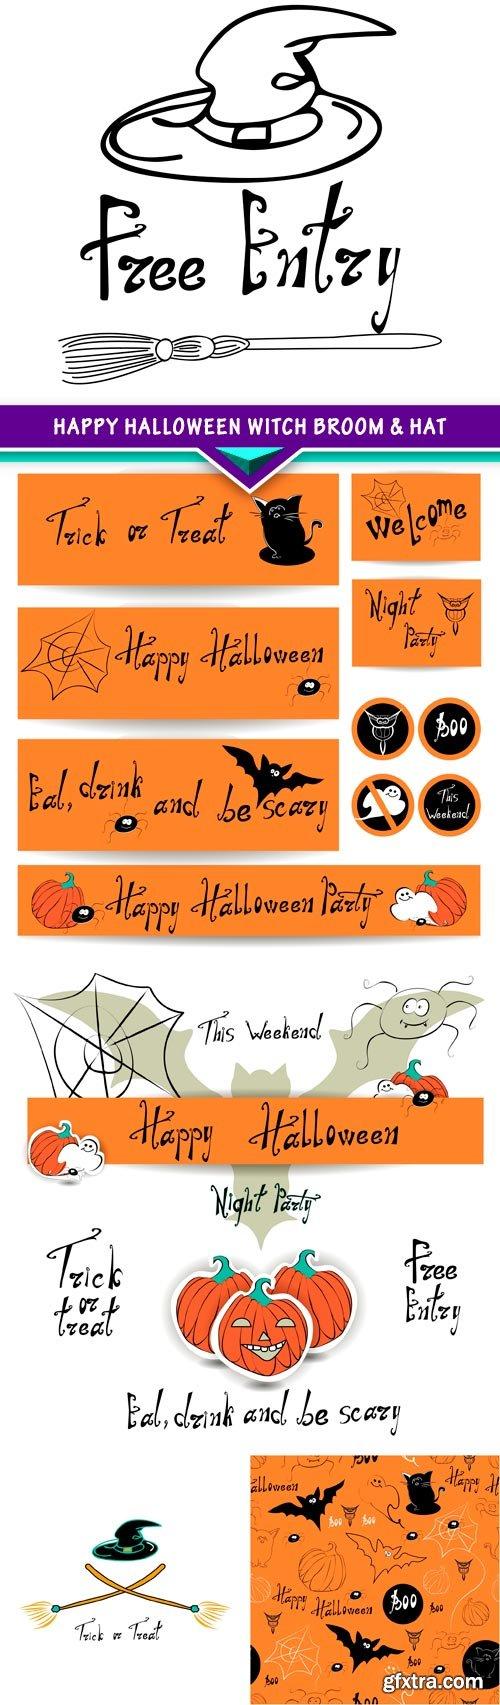 Happy Halloween witch broom & hat 5x JPEG